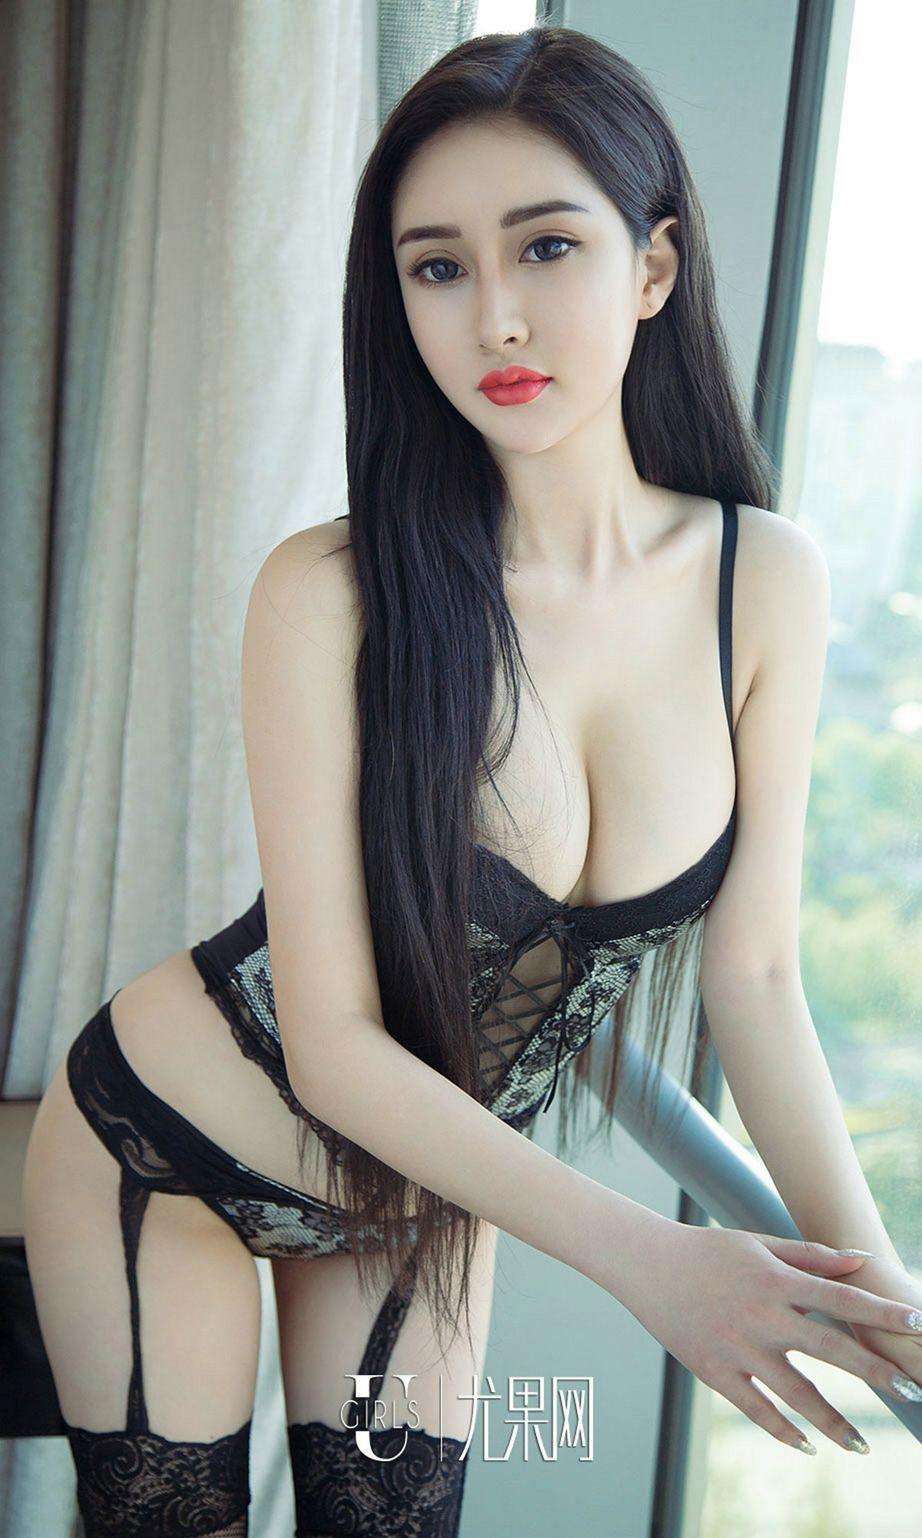 5IDB-228火辣鹅蛋脸美女素人居家粉嫩内衣美腿玉足性感可人写真